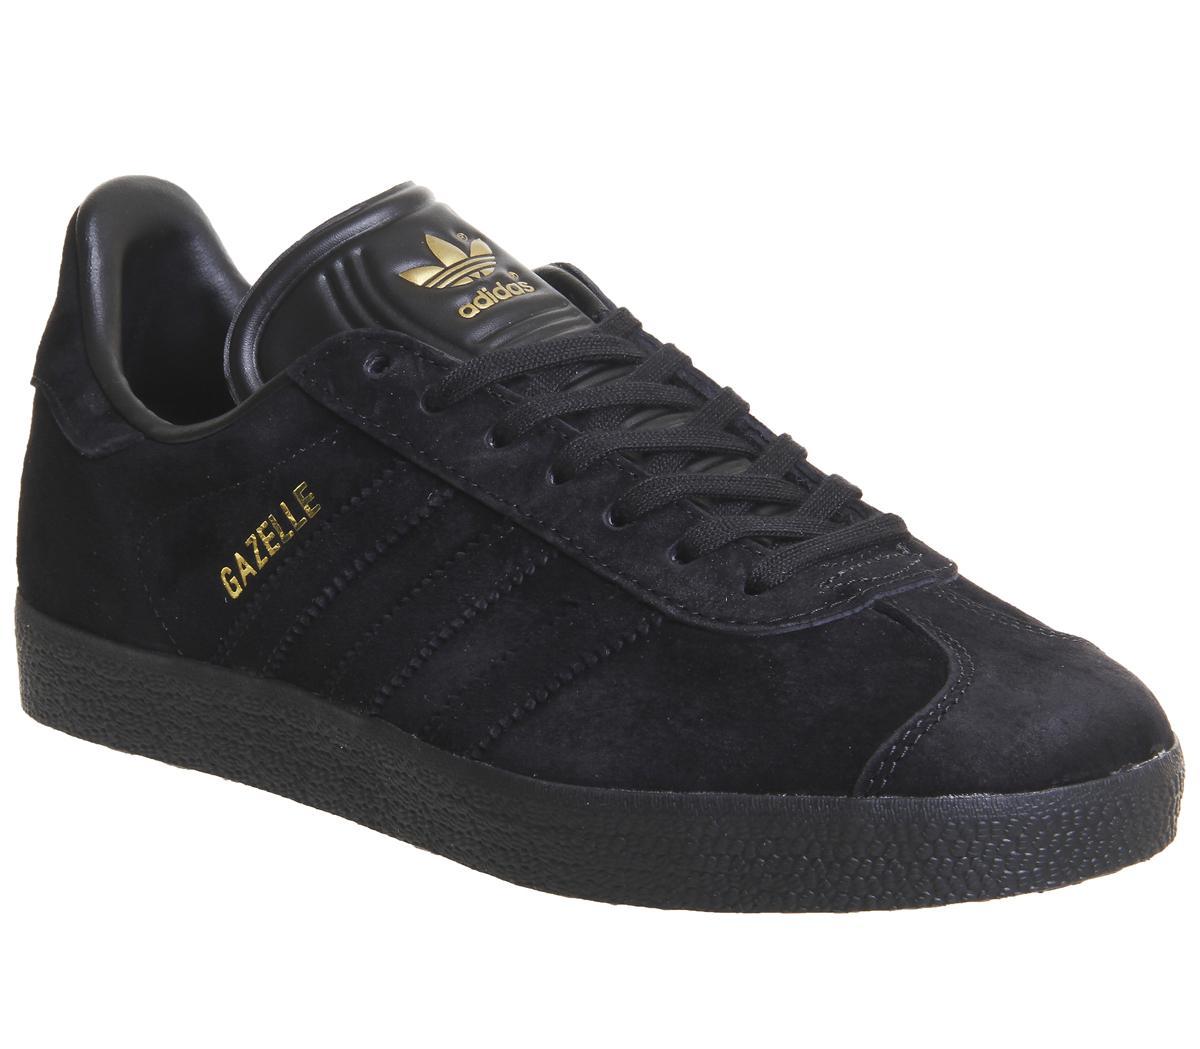 adidas Gazelle Trainers Black Gold